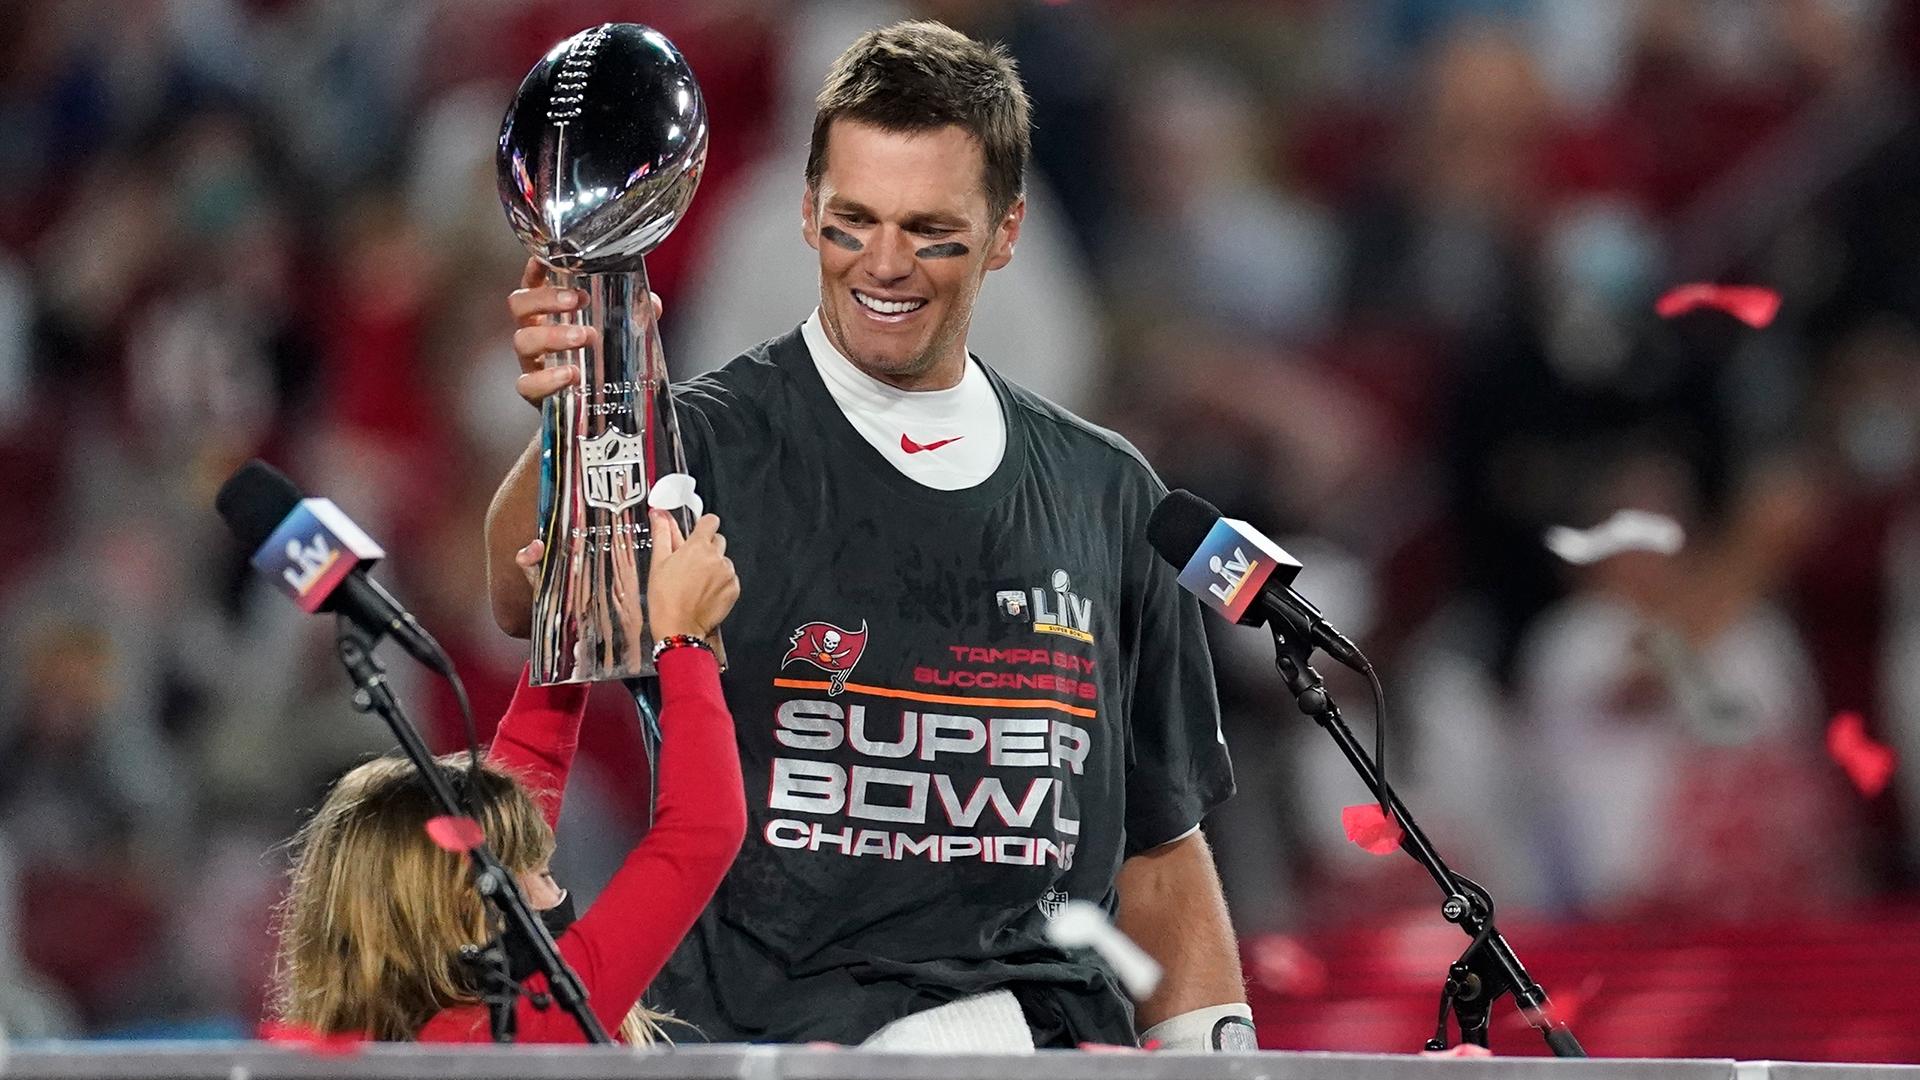 www.yahoo.com: The Rush: Tampa Bay Raptors, Tom Brady's knee and Wendy's trolls the Rays